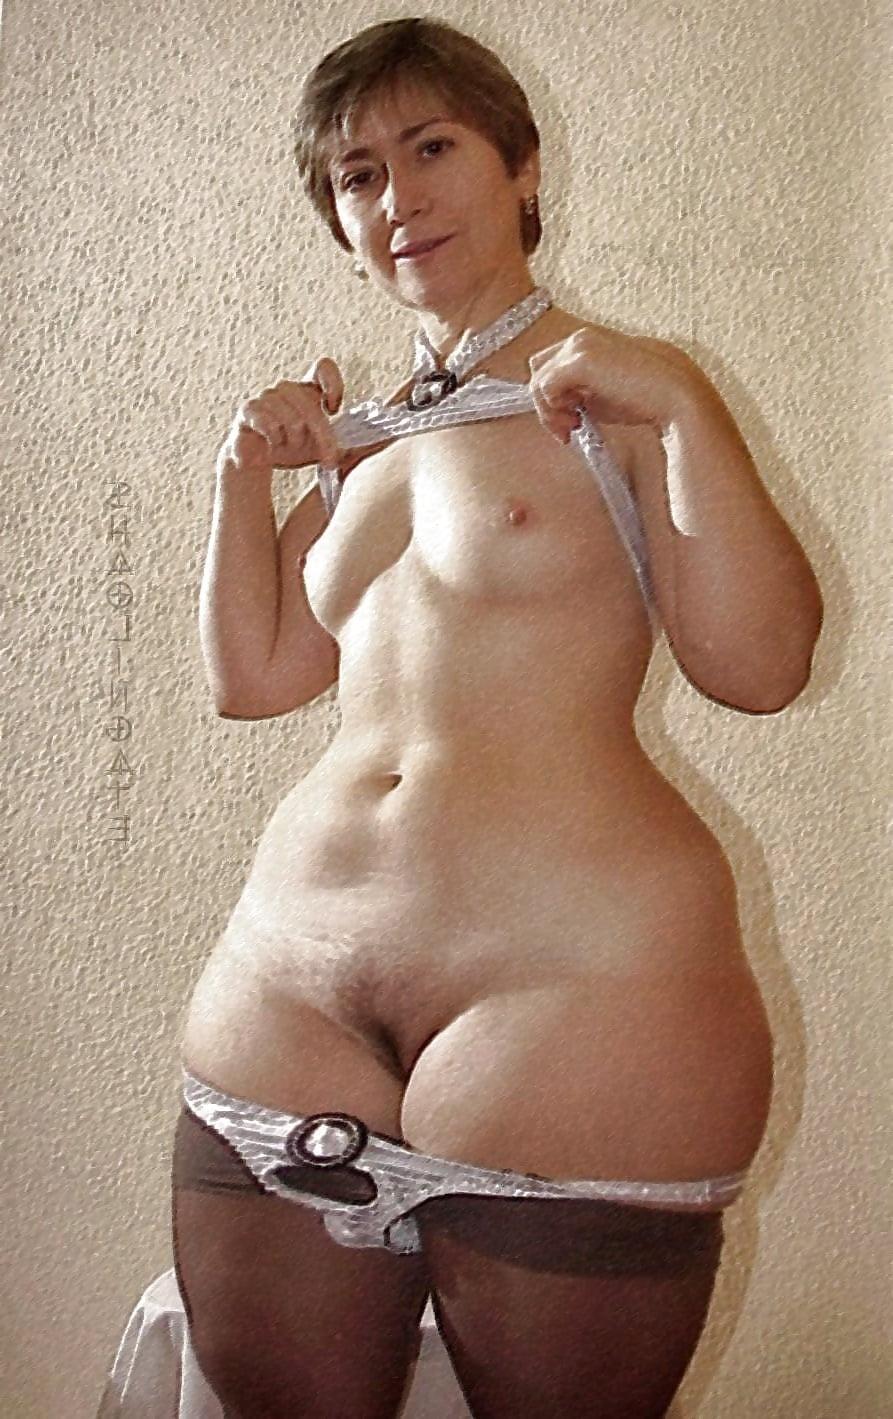 Curvy Women With Wide Hips - 141 Pics - Xhamstercom-8005